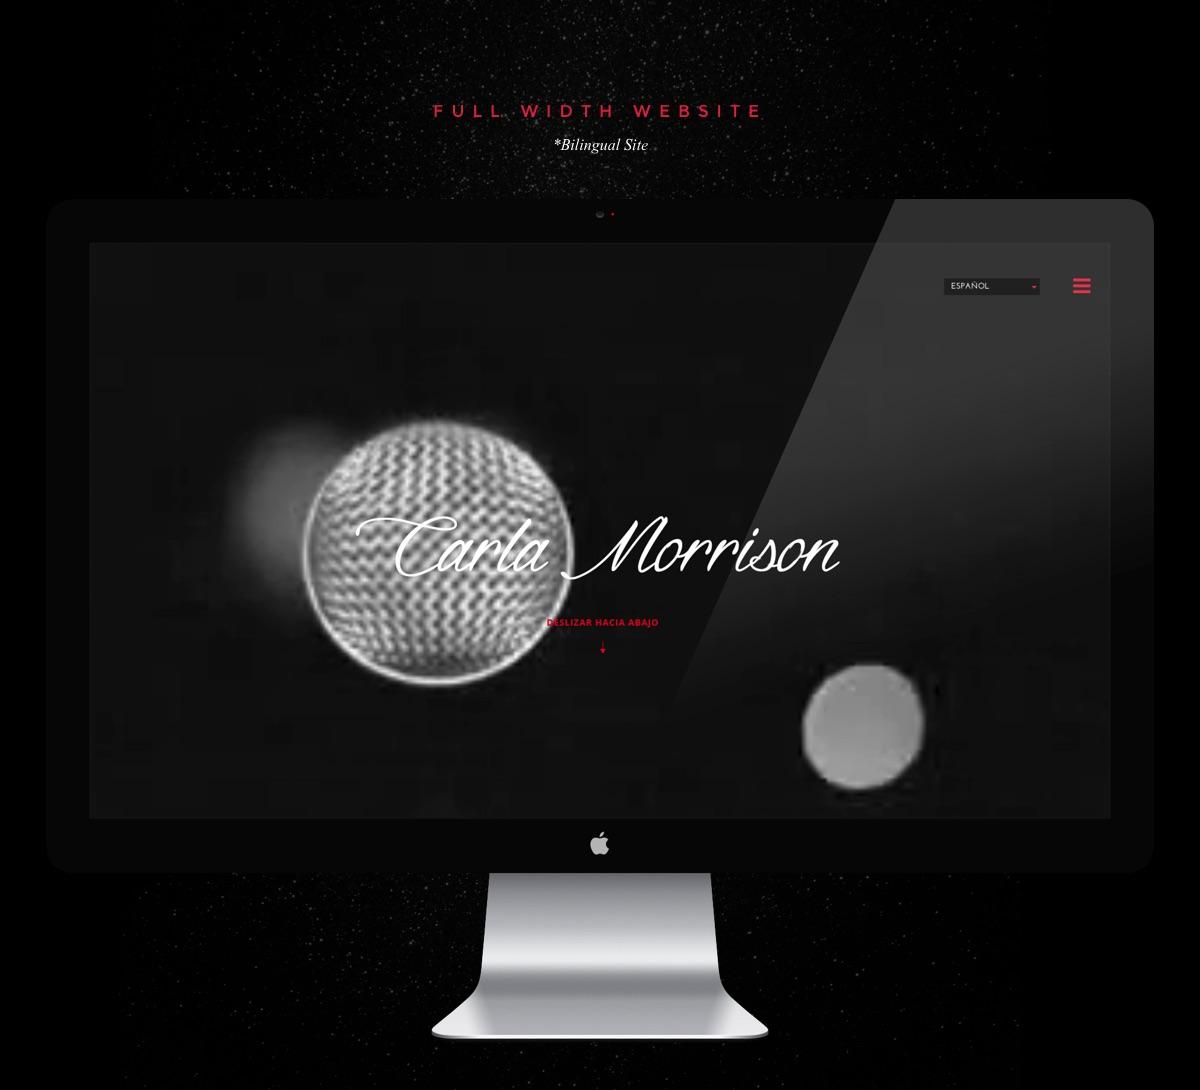 Carla Morrison Website